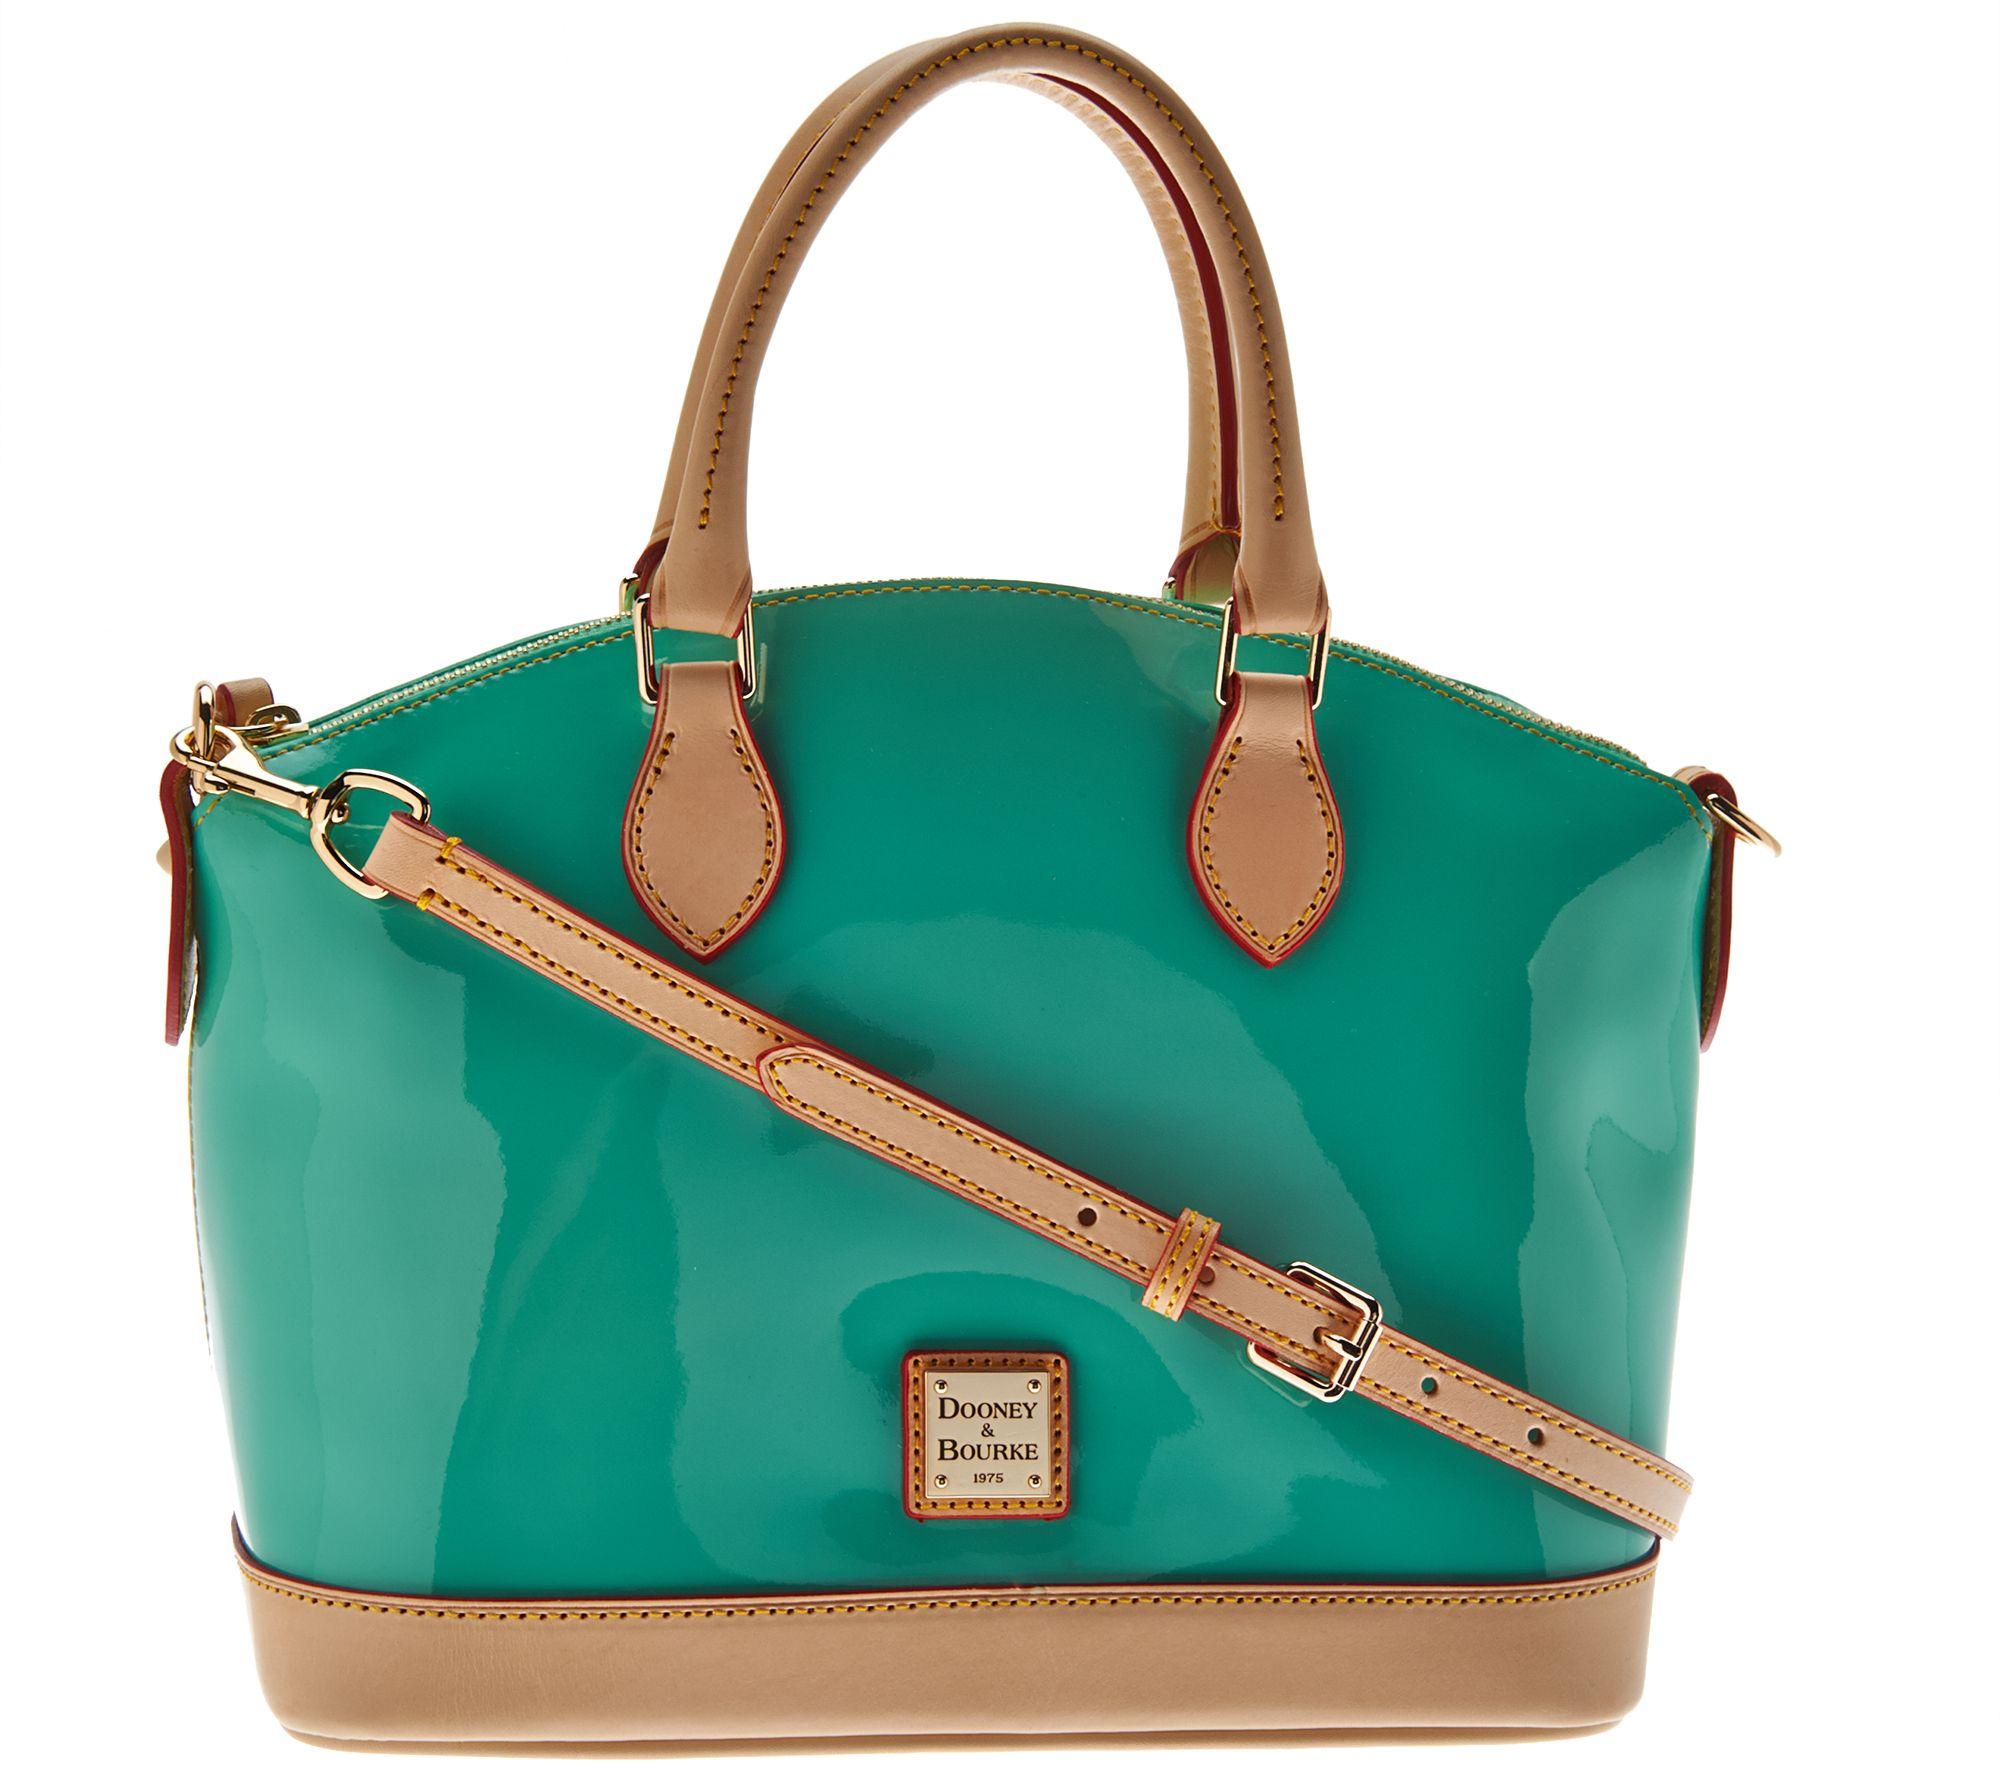 Dooney And Bourke Patent Leather Handbags Handbag